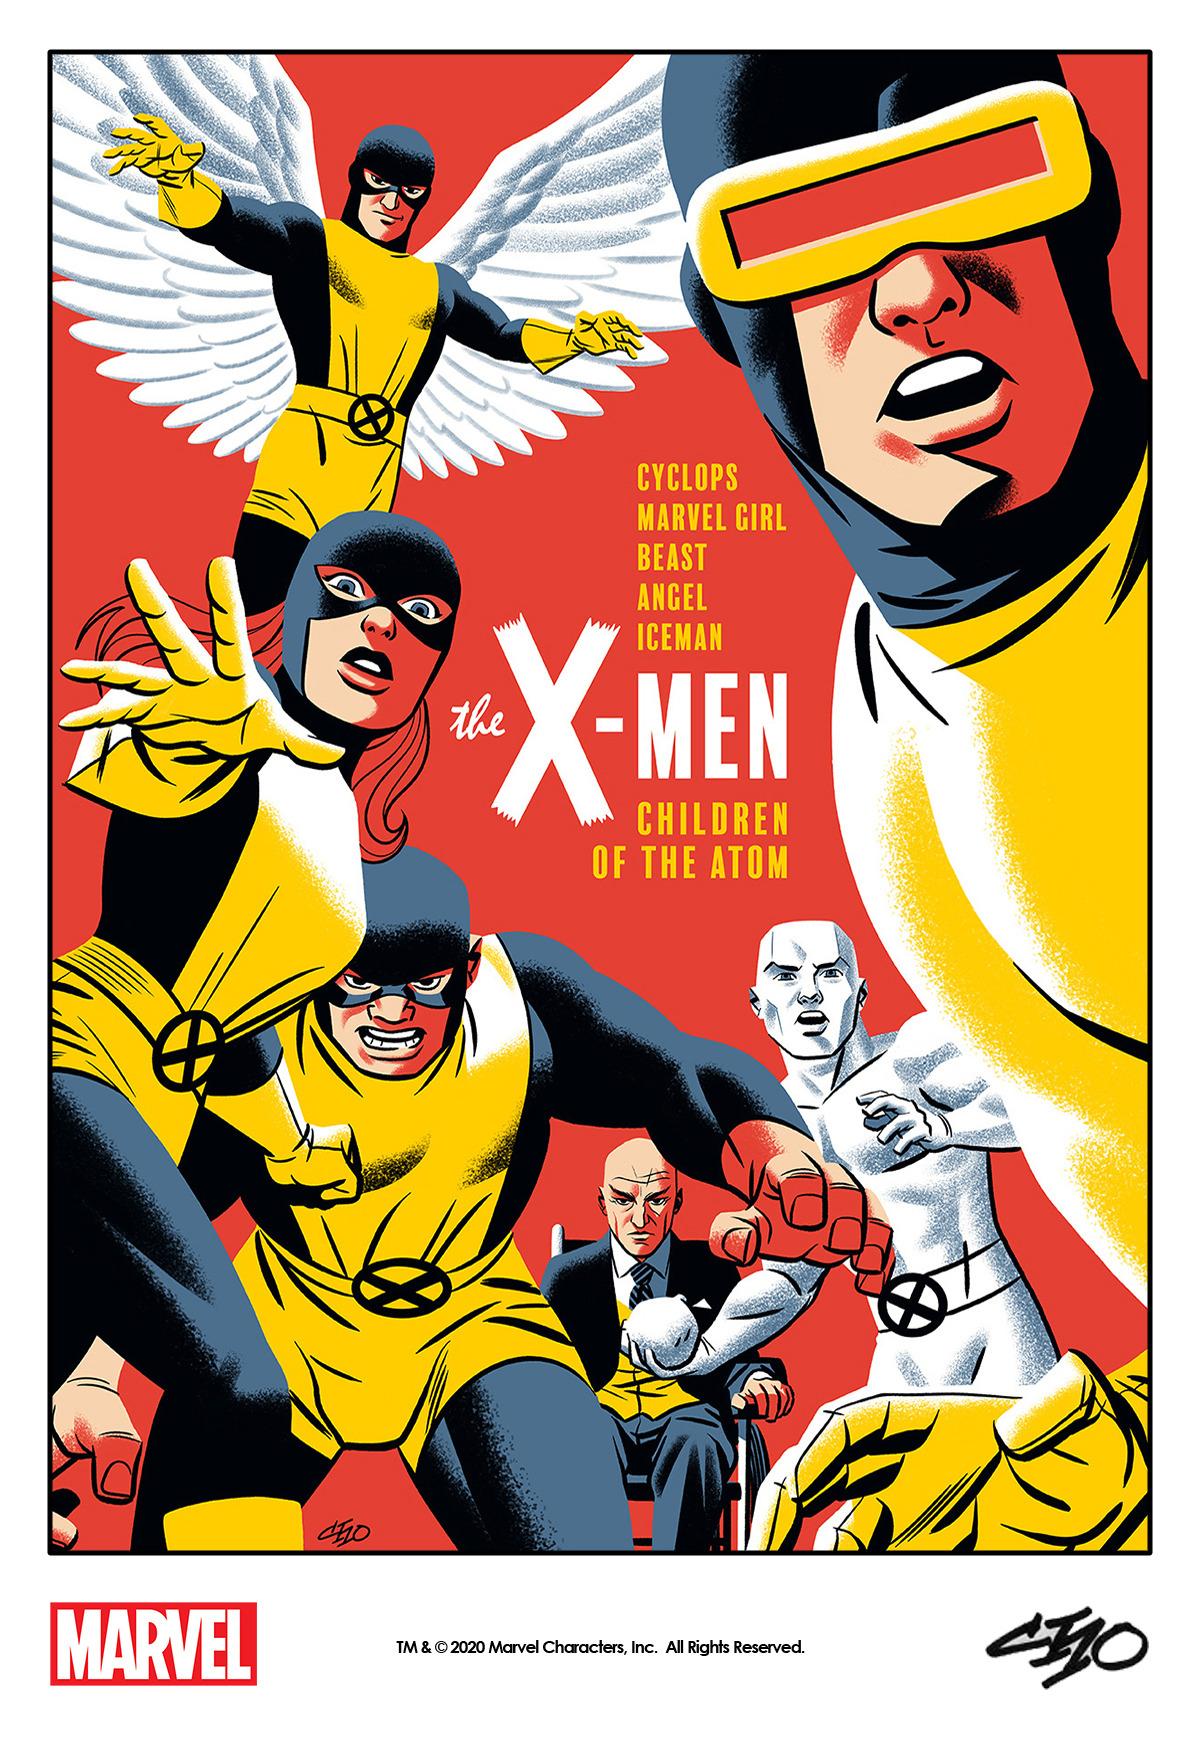 Pin By Bert Logan On Pre Uncanny X Men X Men Poster Prints Comics